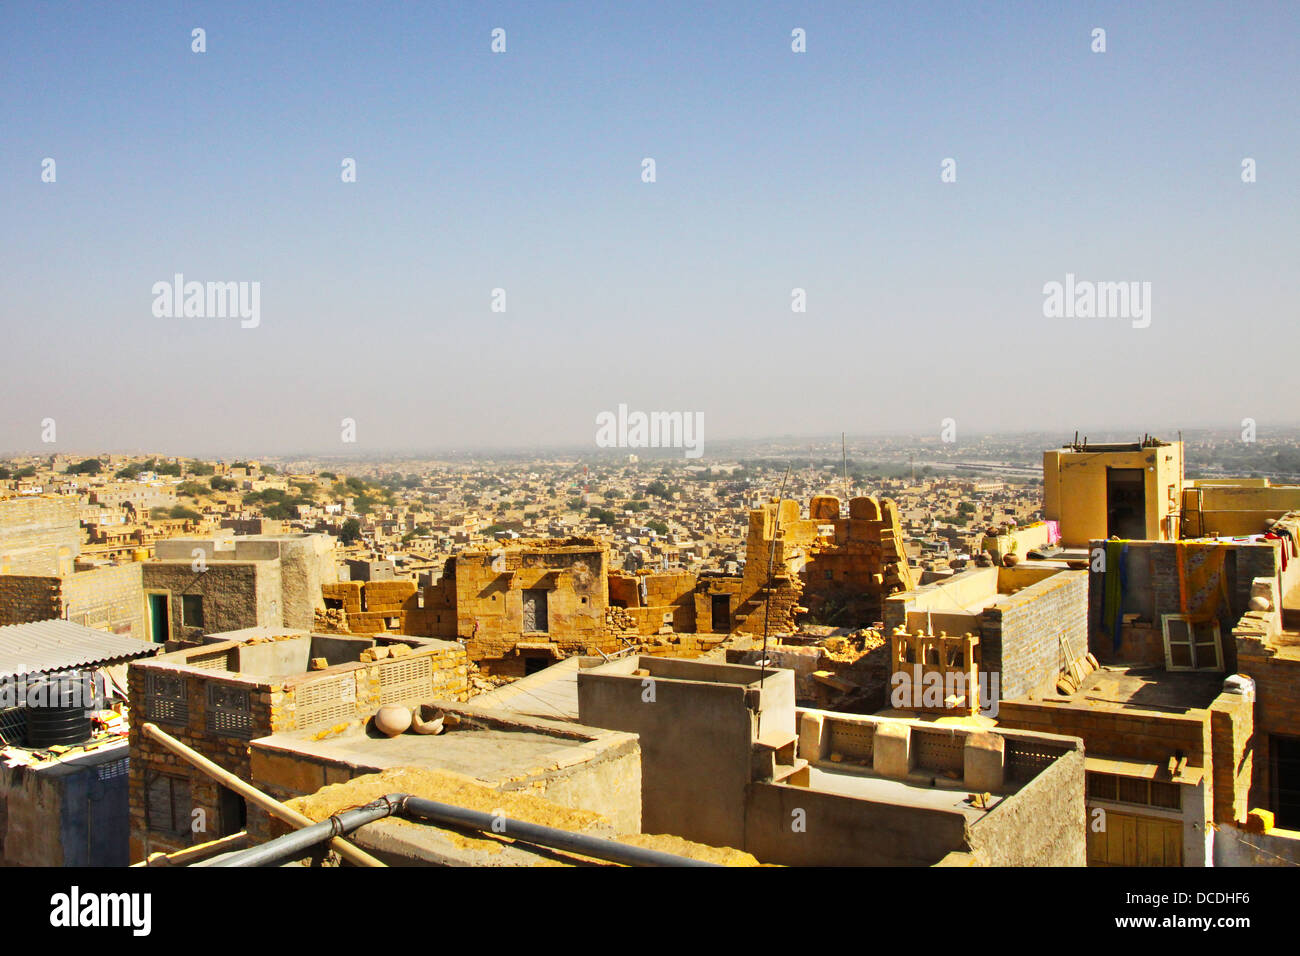 La città di Jaisalmer è in dessert Thar in Rajastan, India ed è stata fondata dal re Rajput Majaraja Immagini Stock